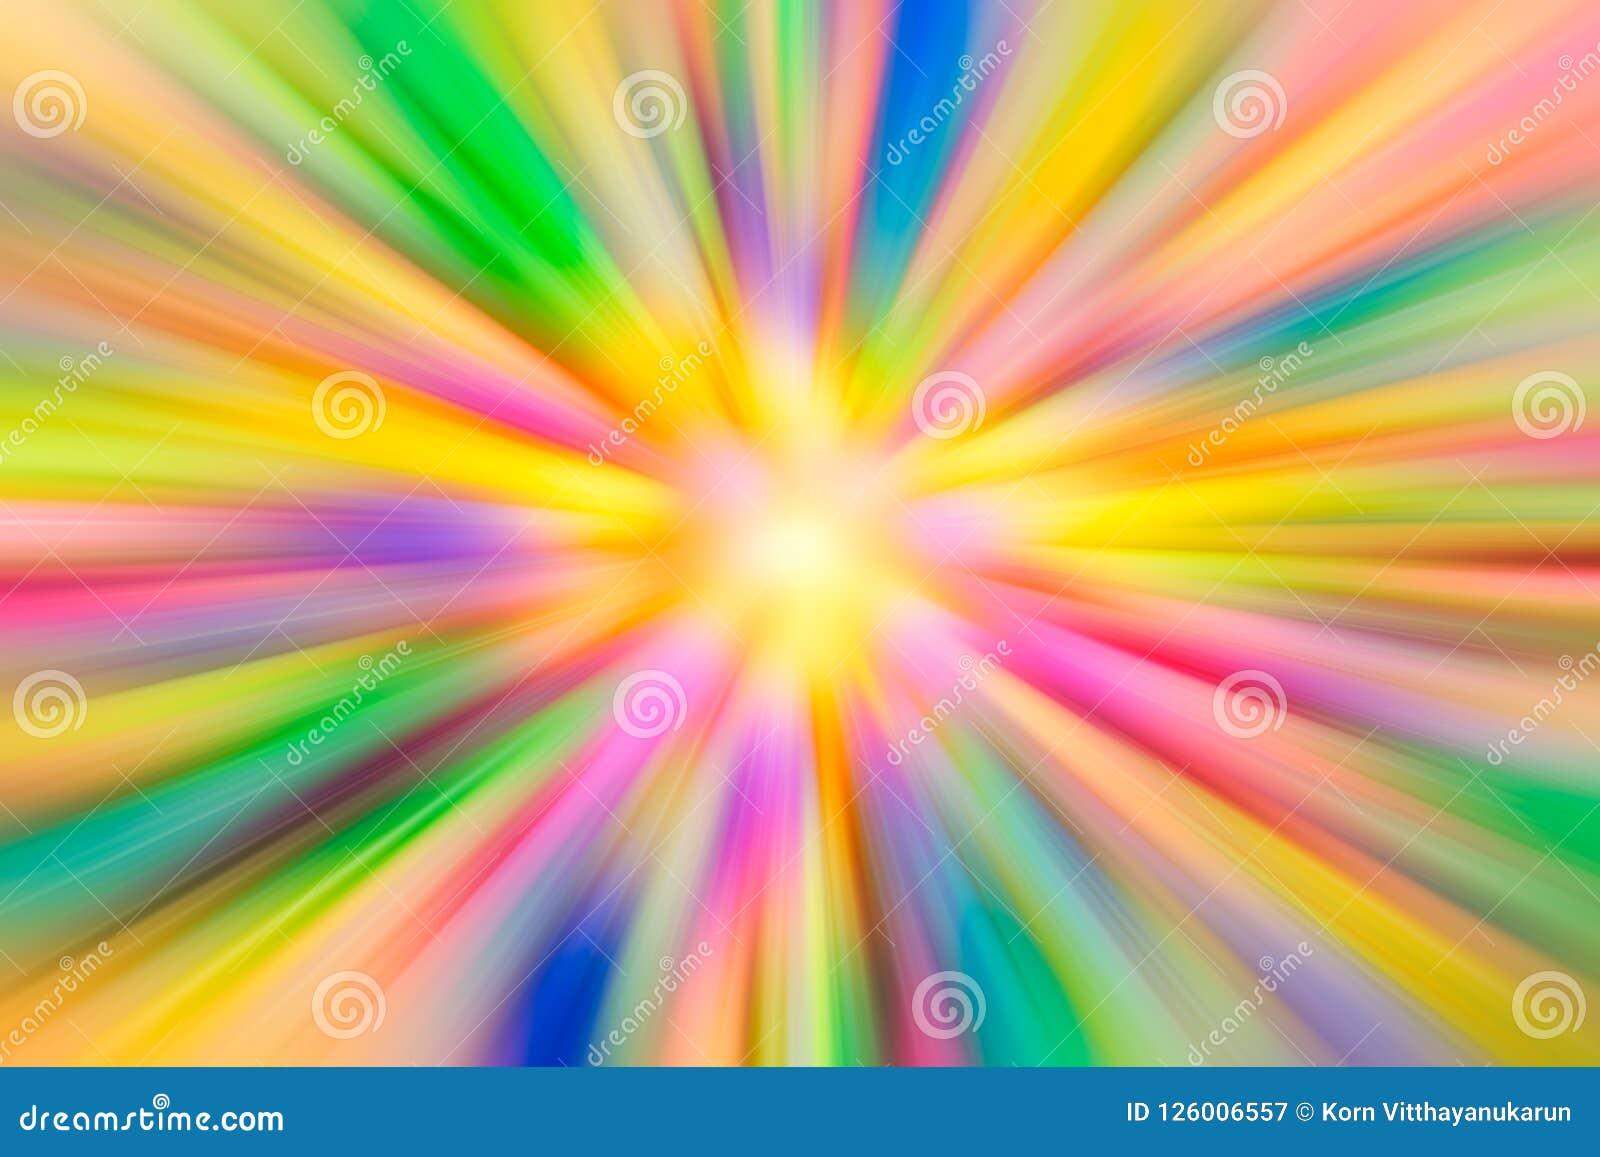 Colorful vivid vibrant colors Acceleration super fast speed motion